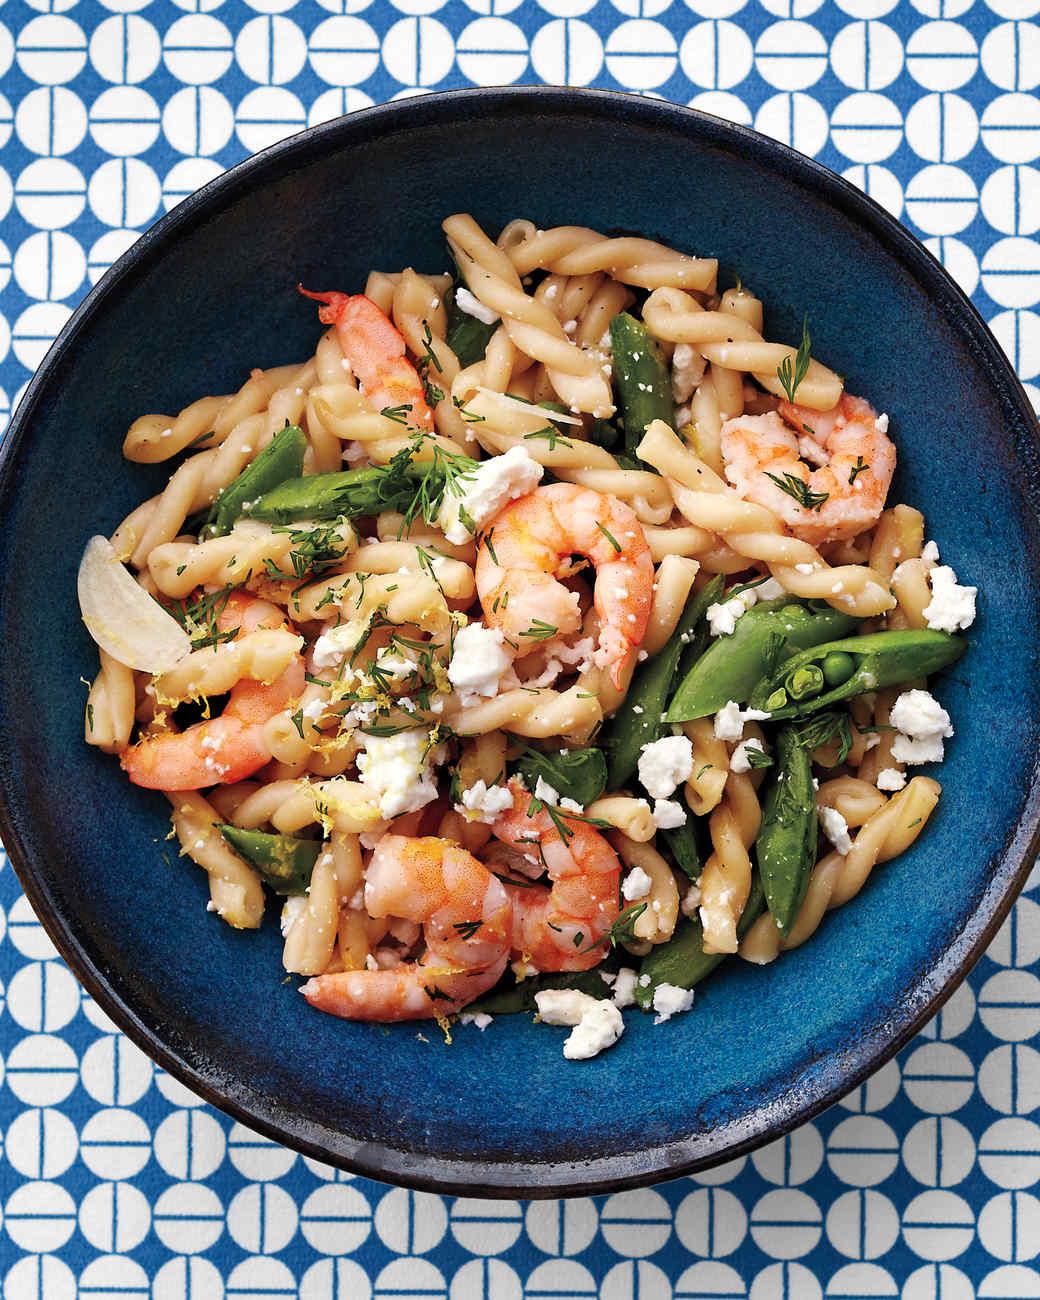 shrimp-pasta-plated-182-d111921.jpg